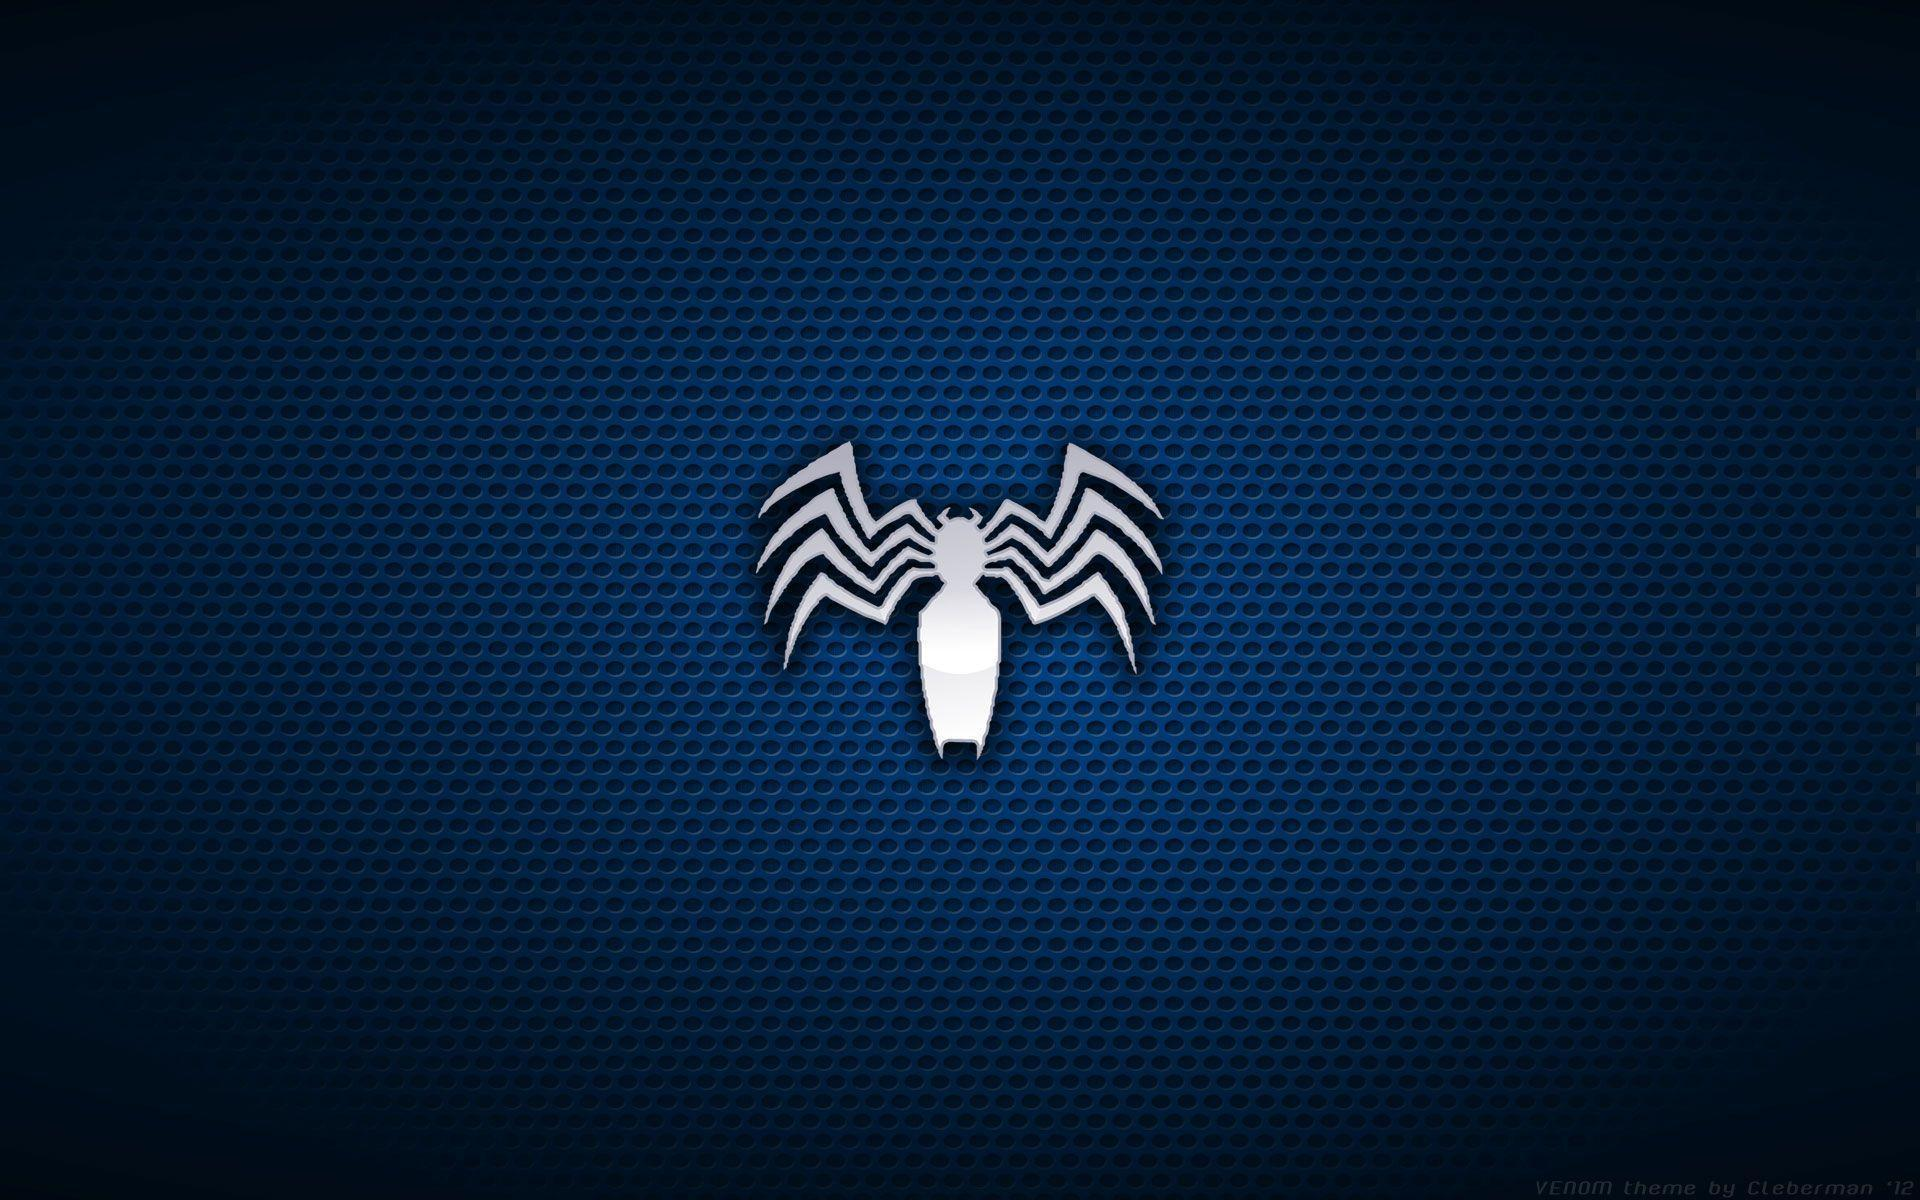 venom hd wallpaper iphone - photo #23